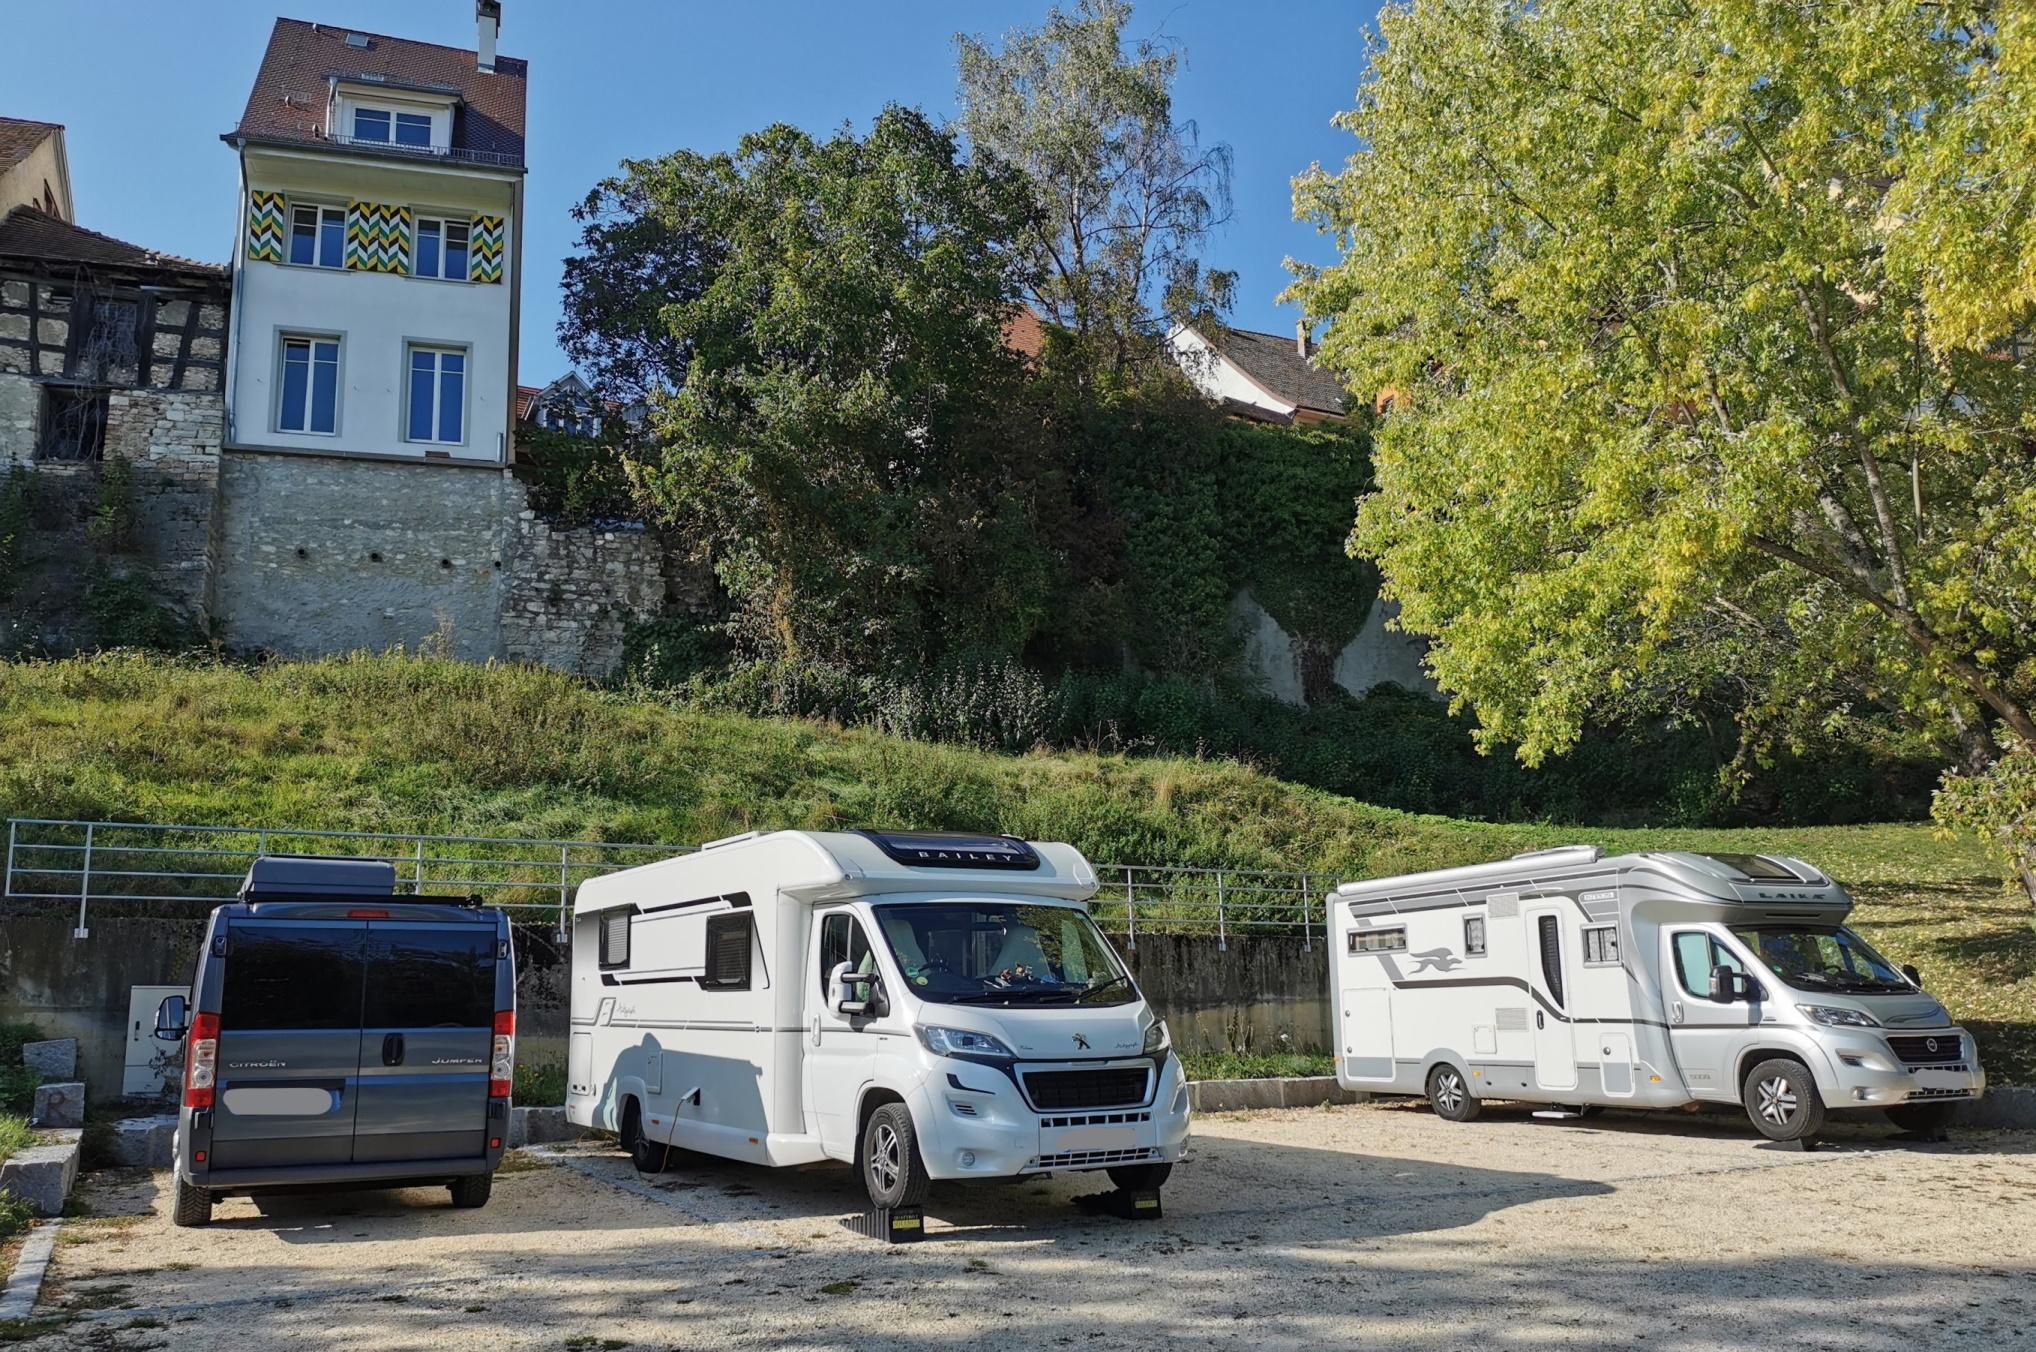 Wohnmobilstellplatz am Felsenparkplatz